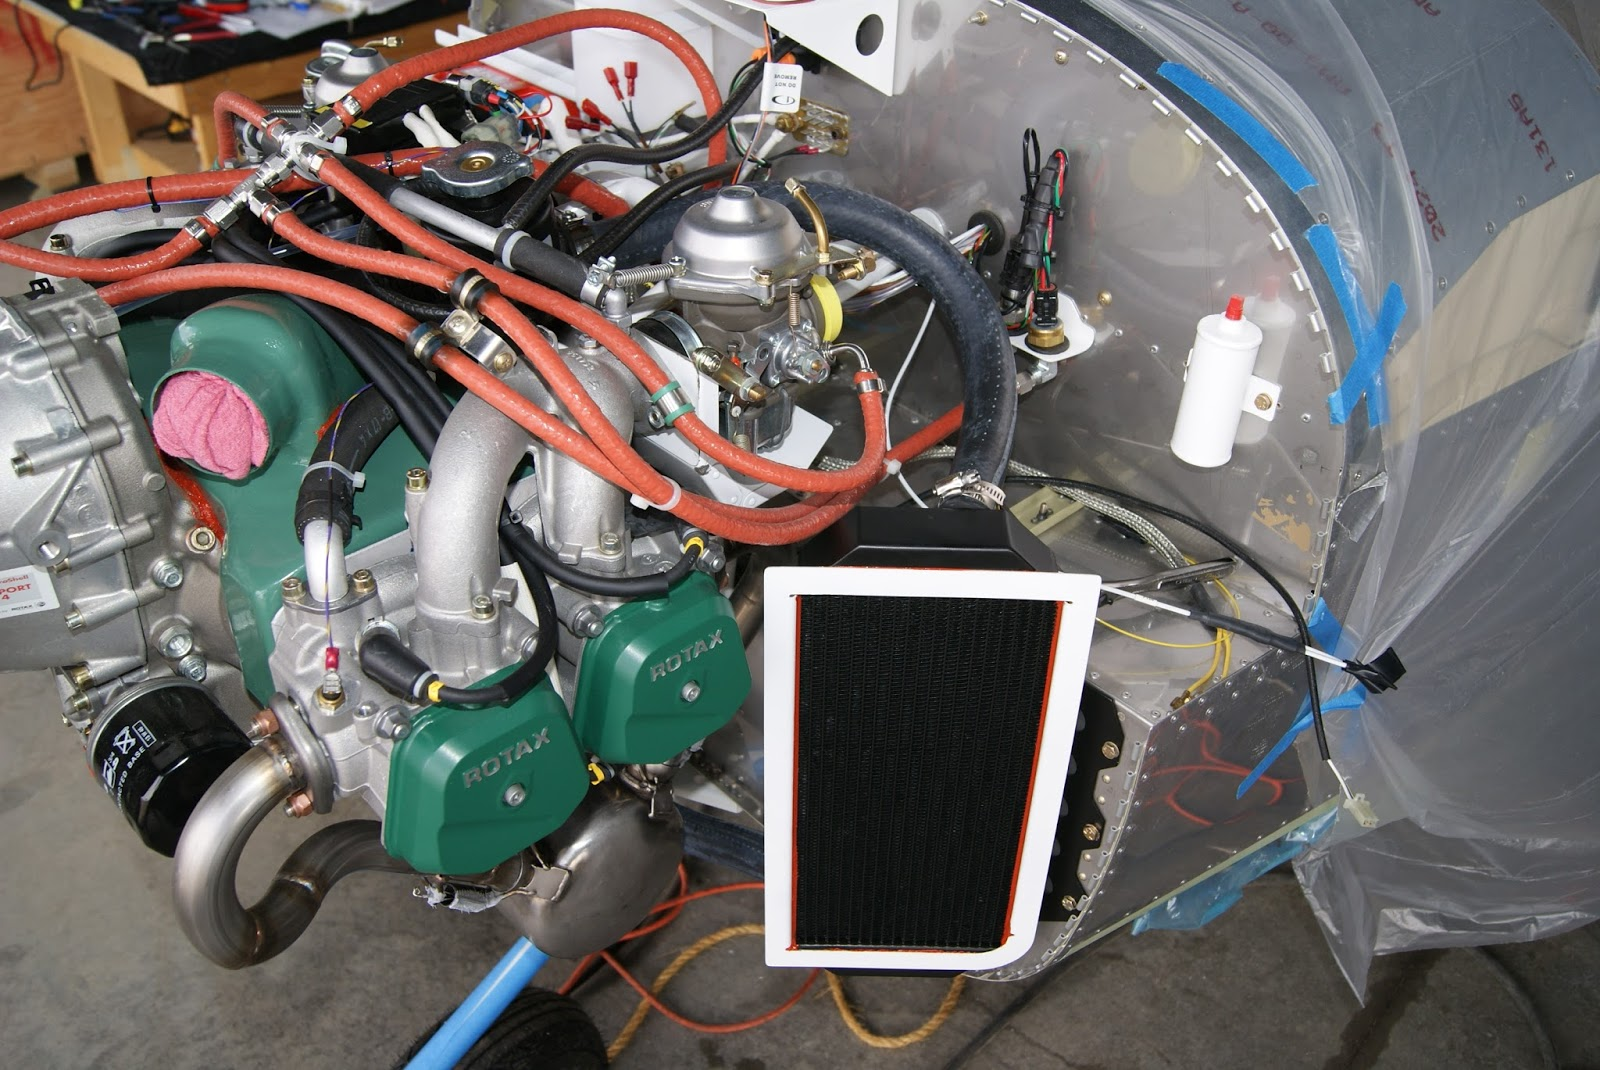 DOG Aviation John\'s RV-12 Blog: Discovered Missing Threaded Hole On ...